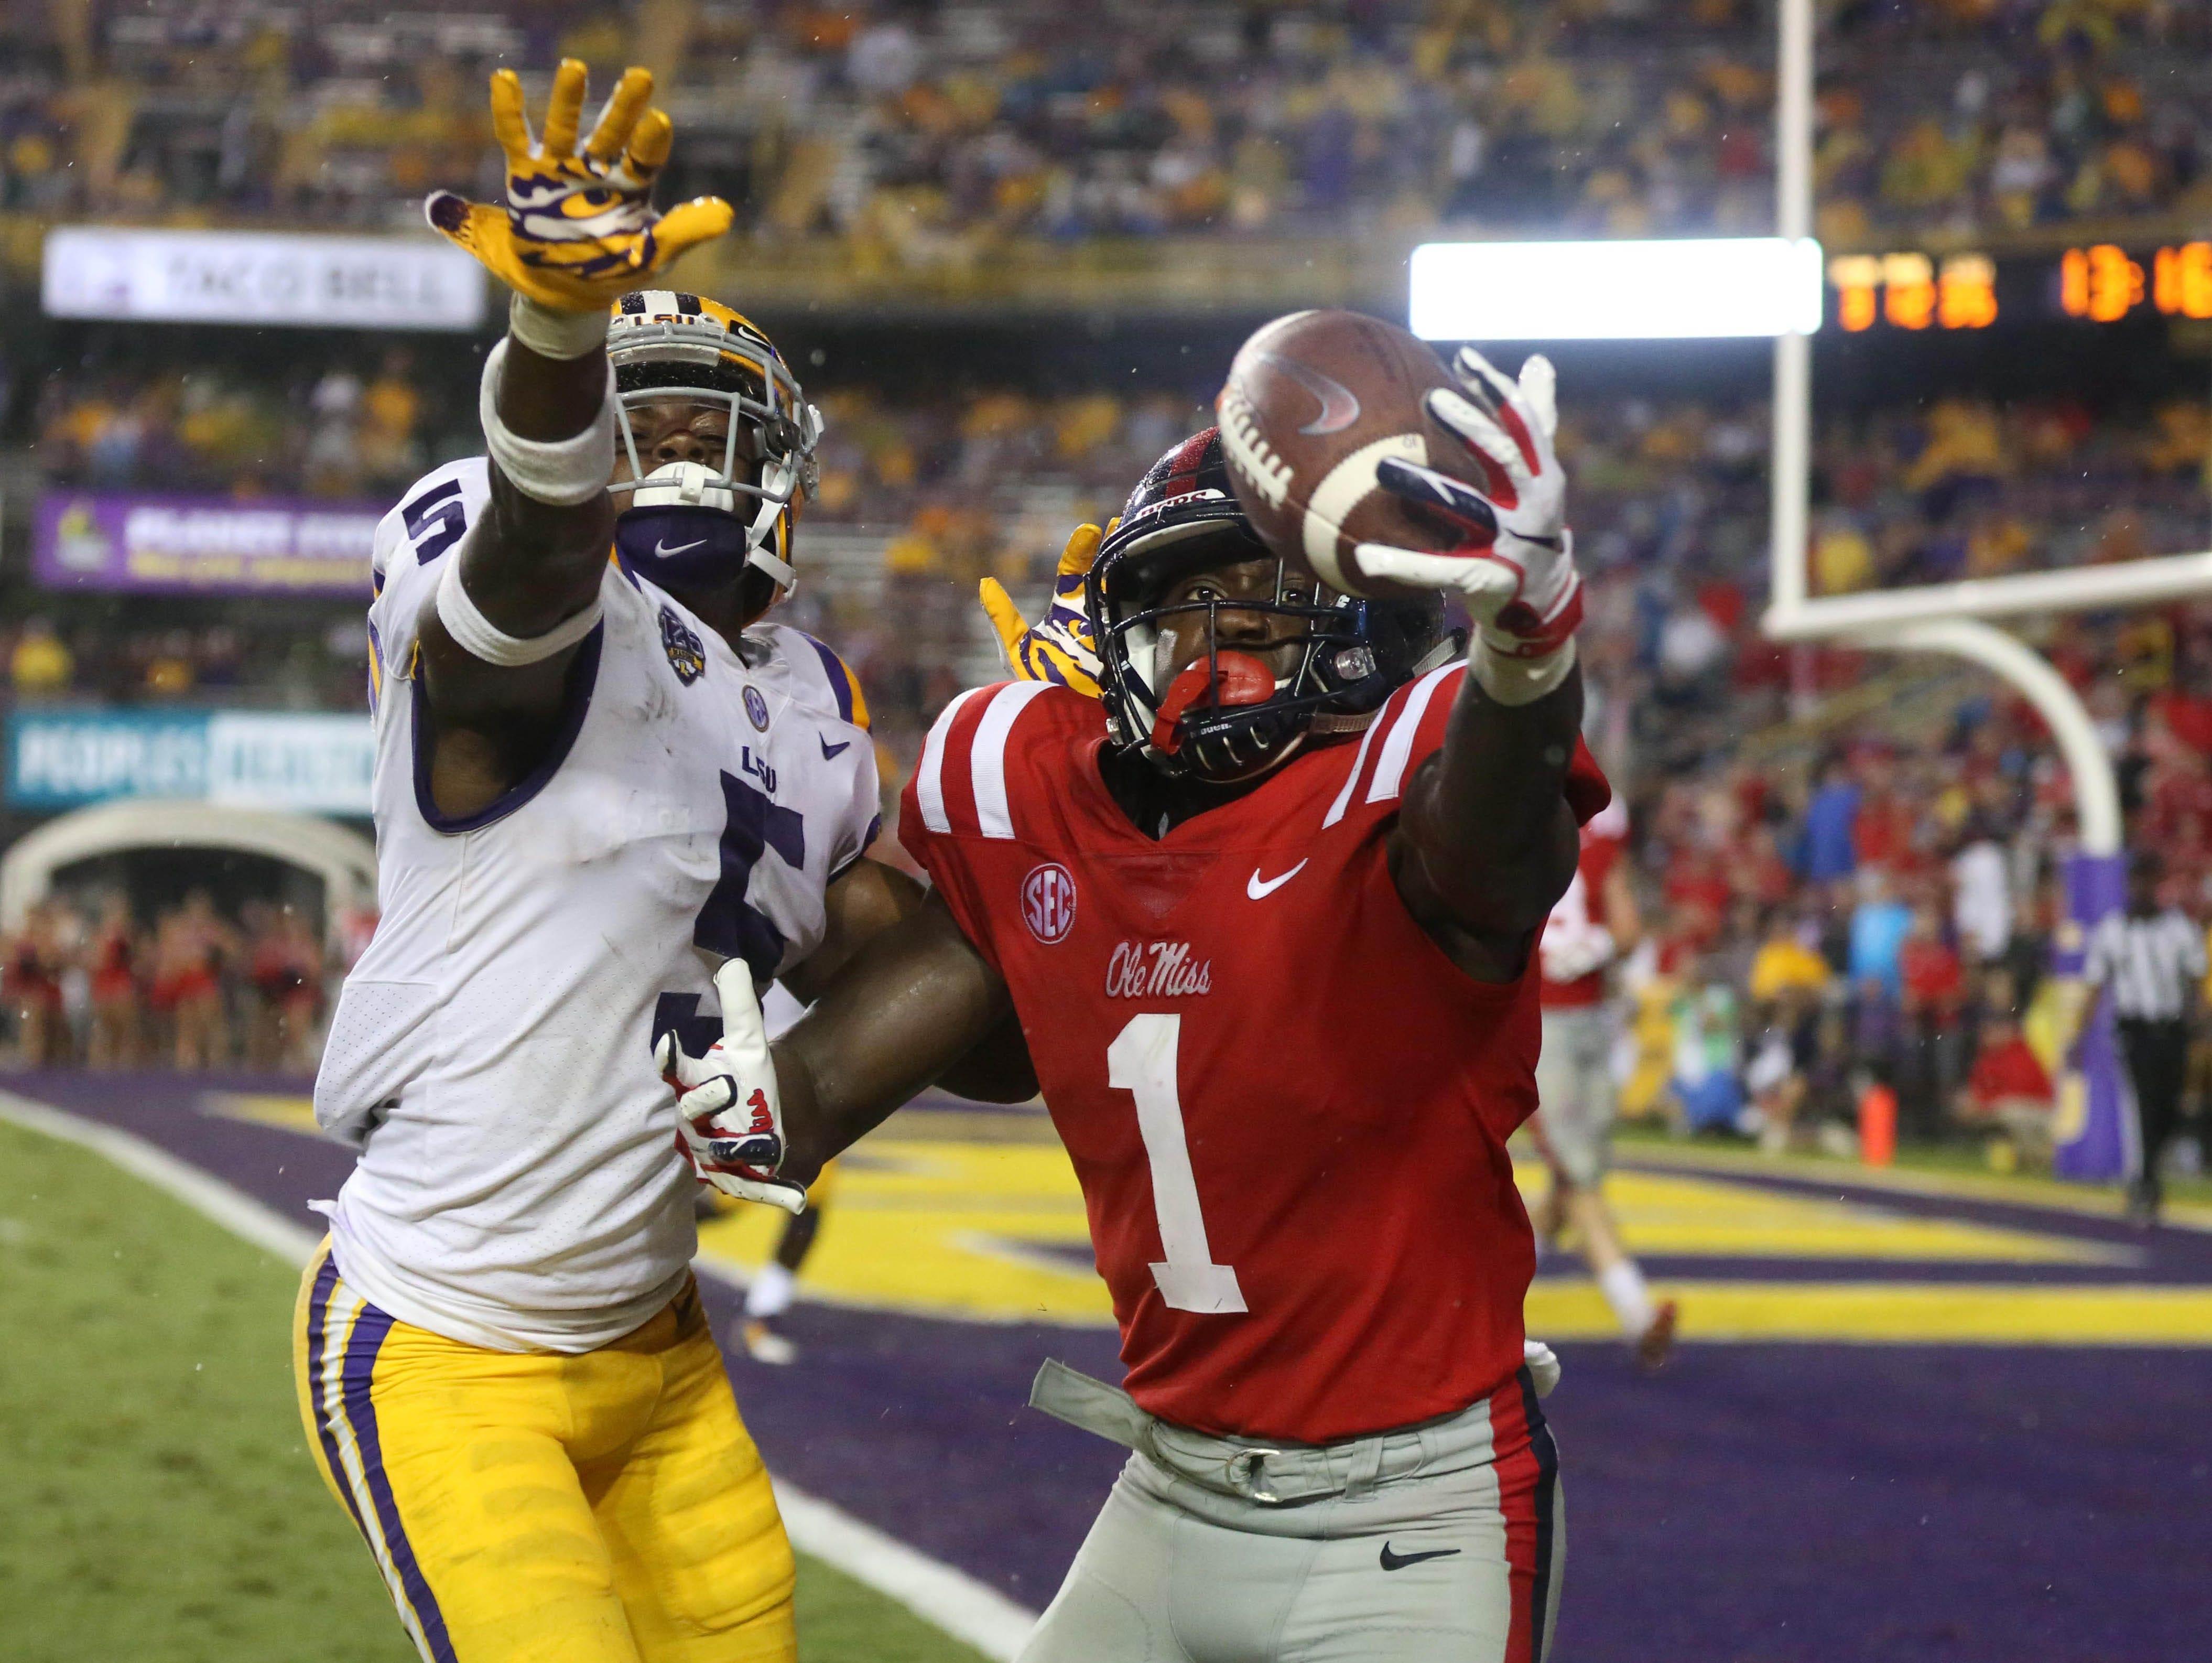 Mississippi receiver A.J. Brown (1) is defended by LSU cornerback Kary Vincent Jr. (5) during a game at Tiger Stadium.